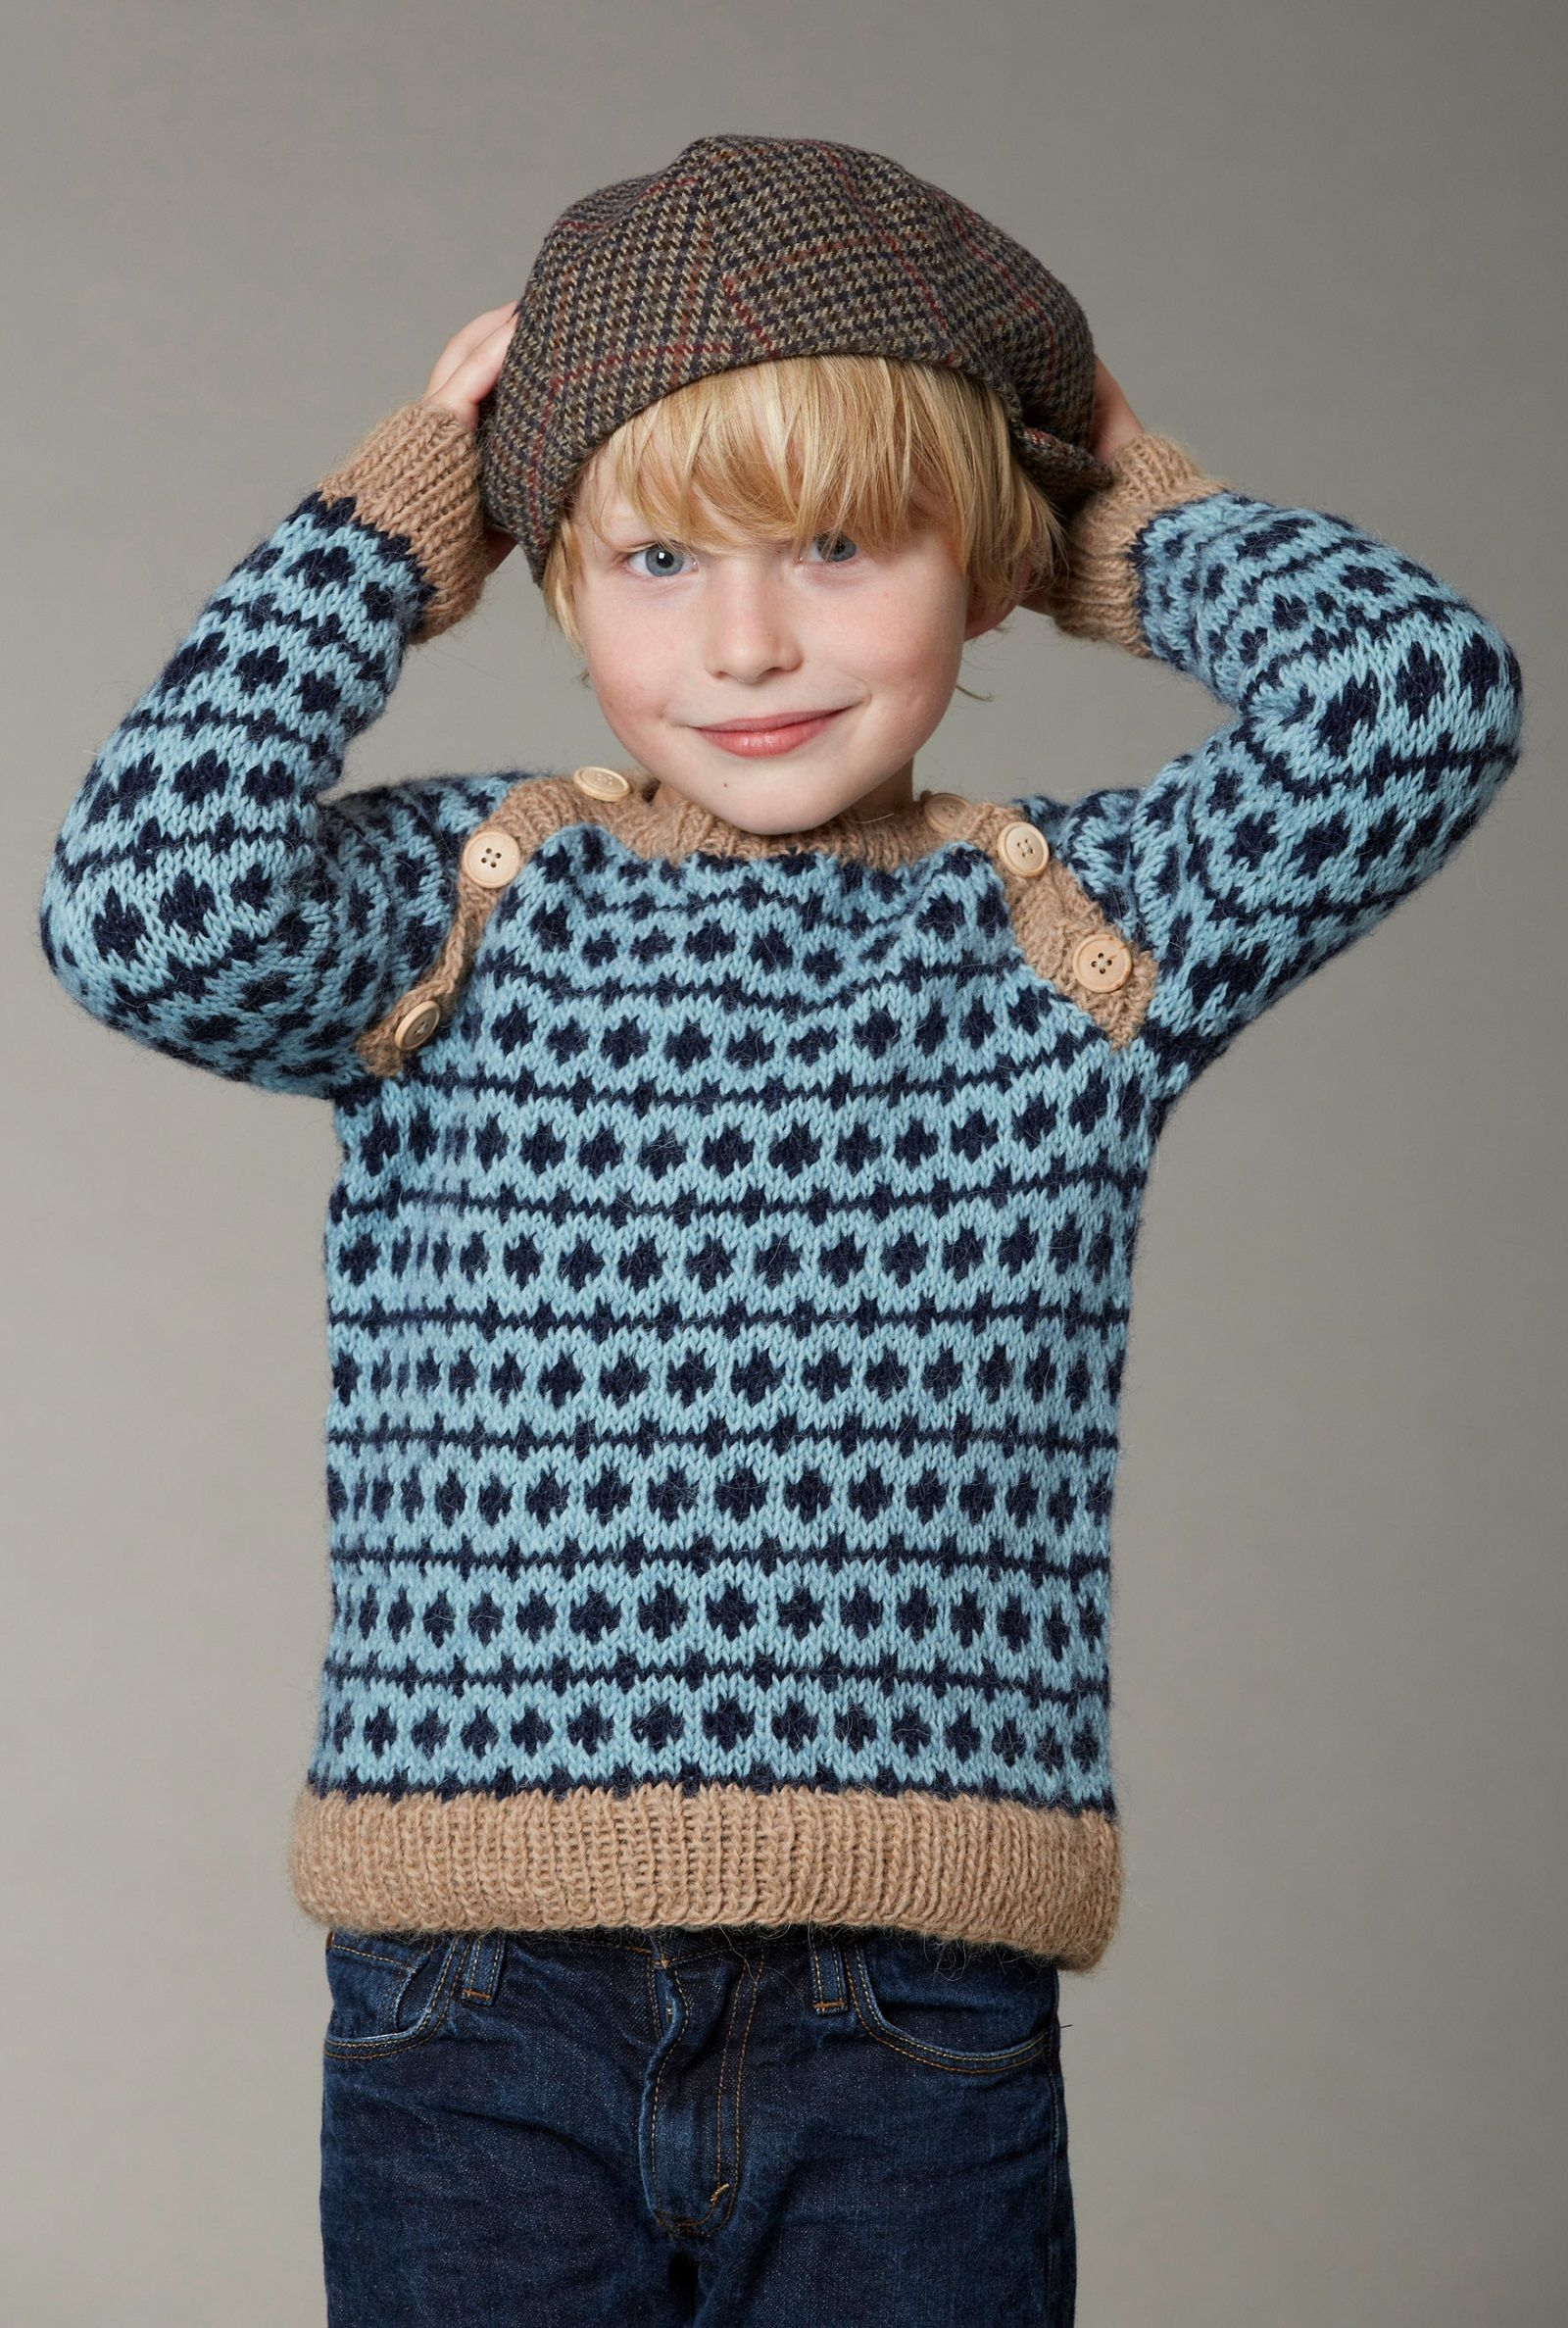 mohair pinterik0 | Pinterest | Fair isles, Alpacas and Knit patterns